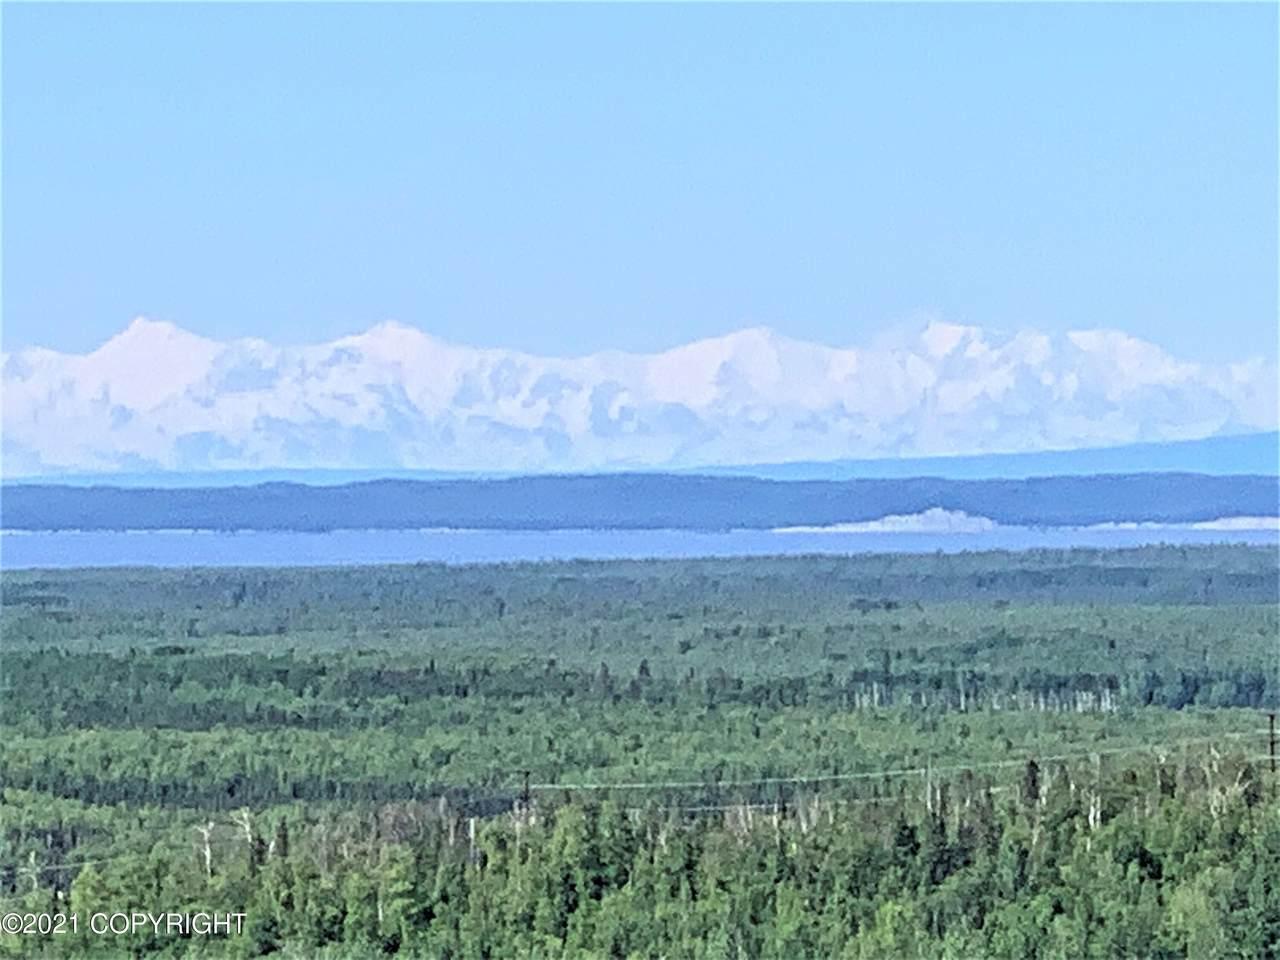 https://bt-photos.global.ssl.fastly.net/alaska/1280_boomver_2_21-8918-2.jpg